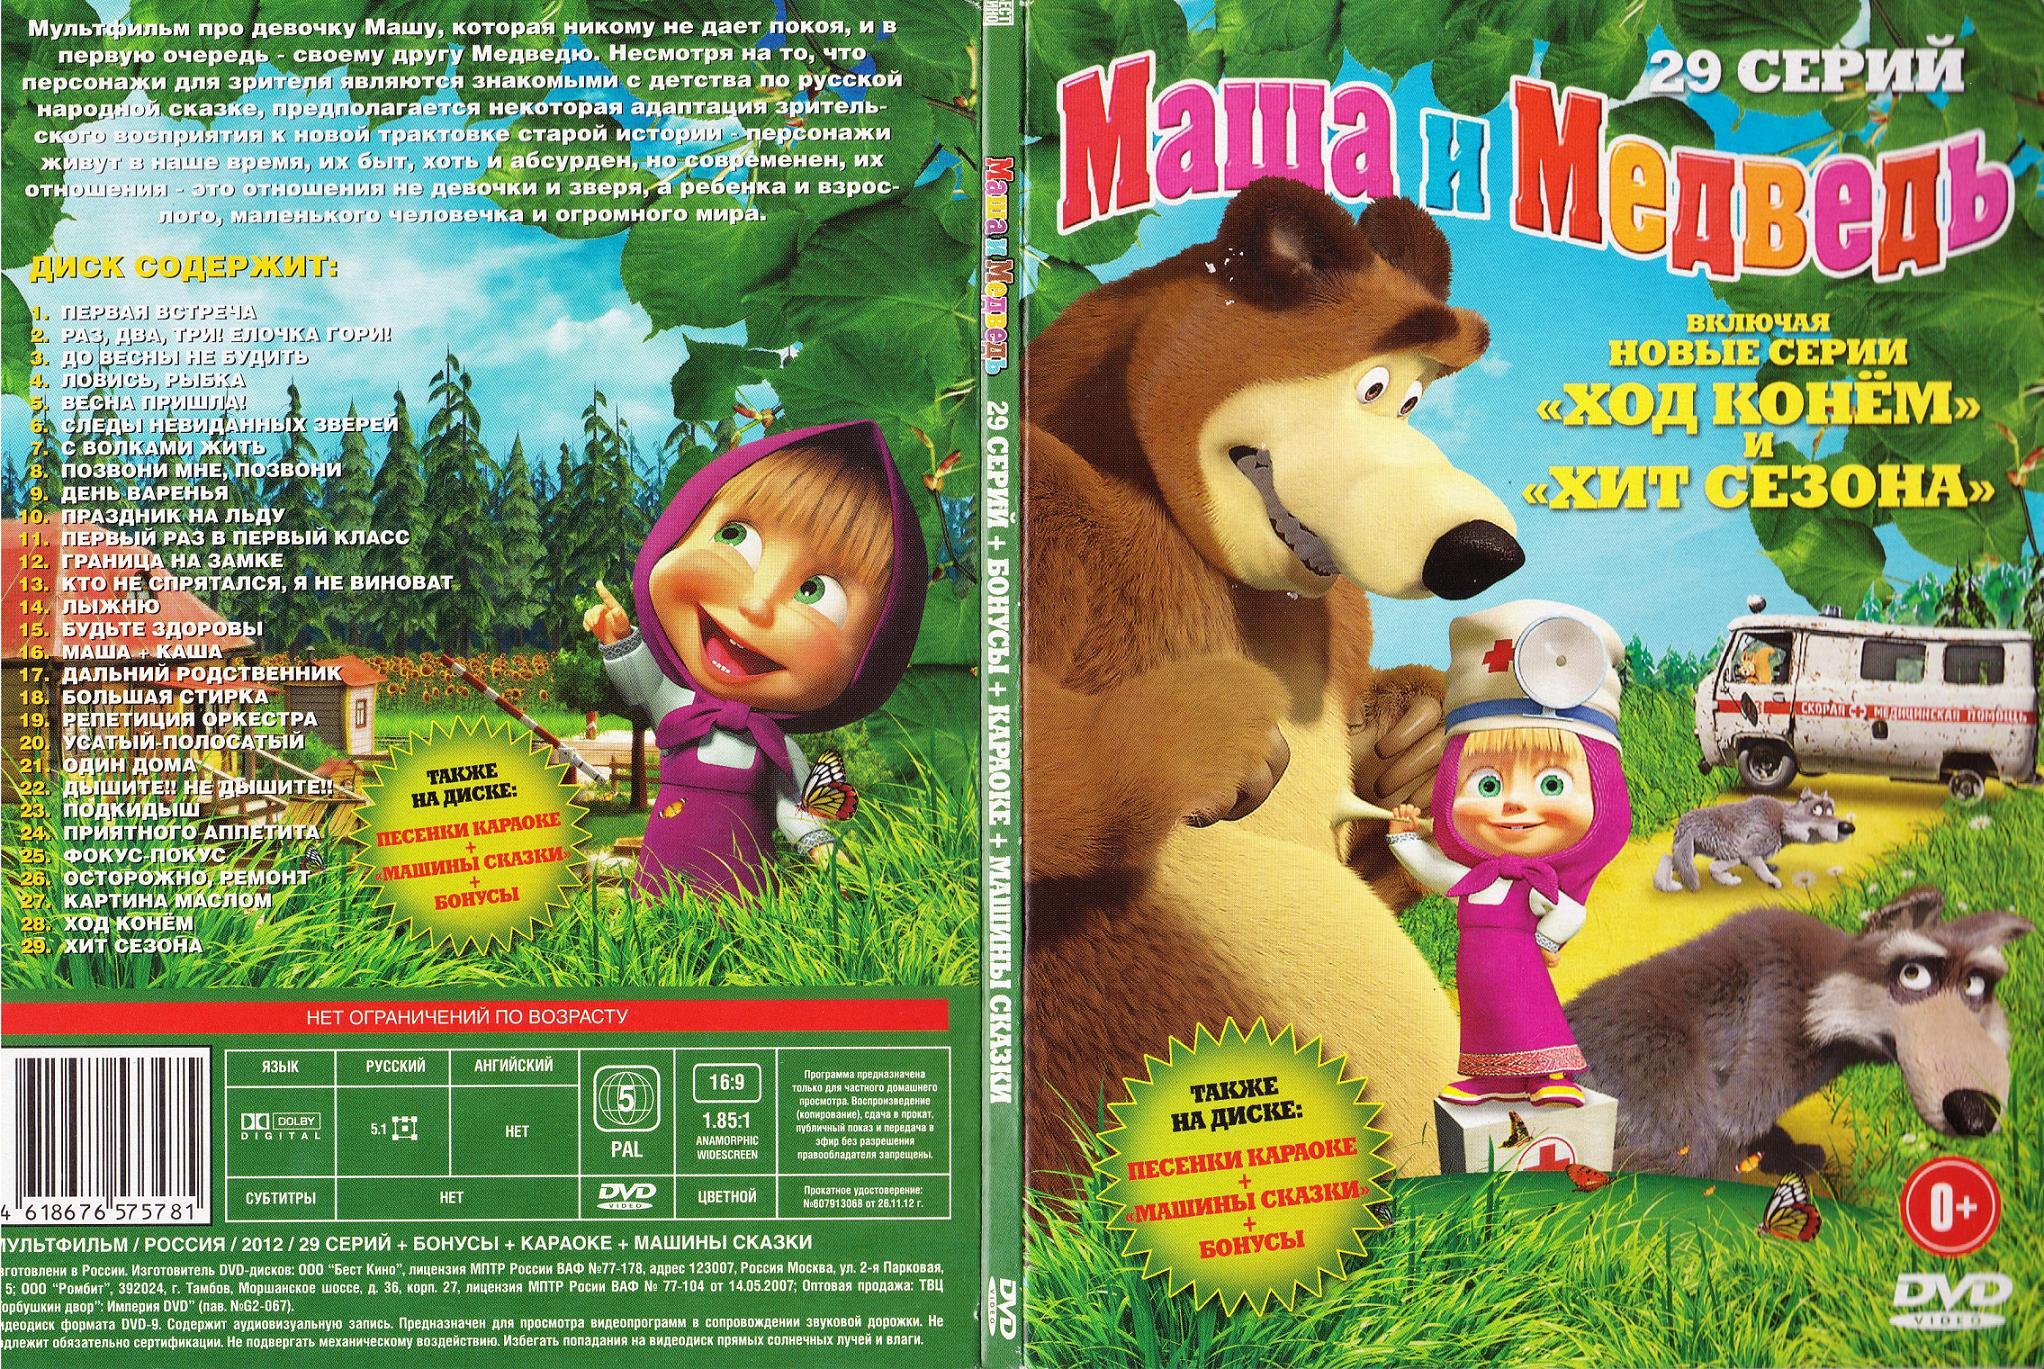 Маша и медведь картинки на диск